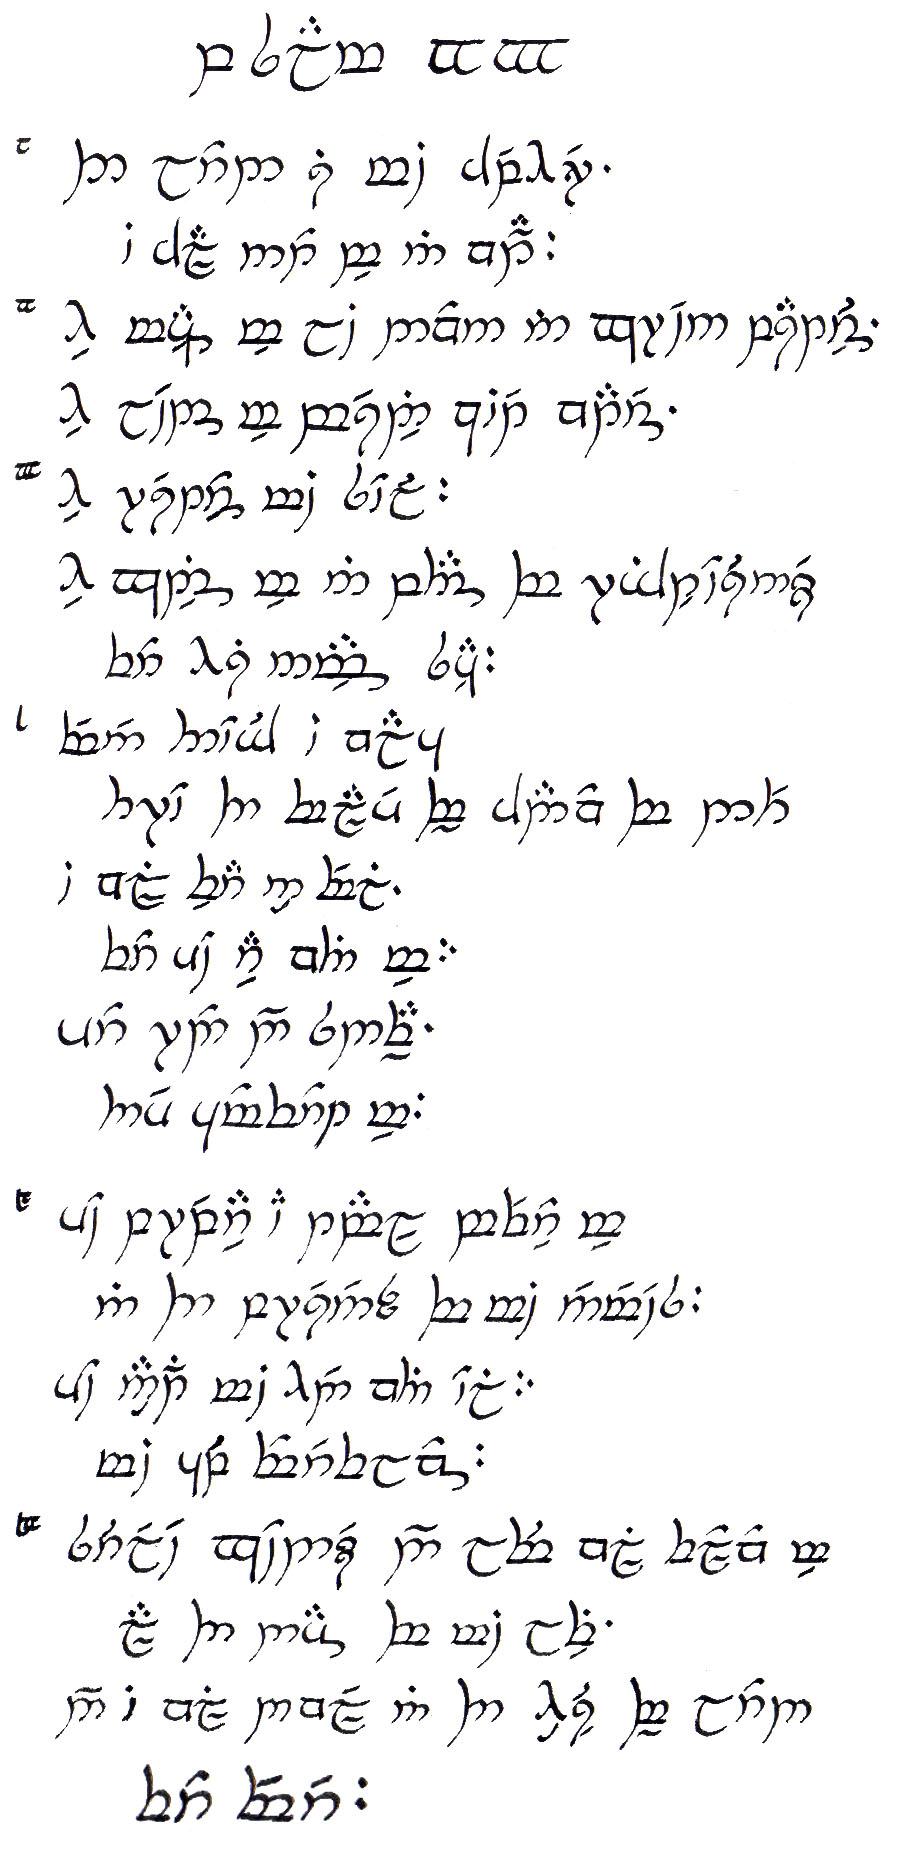 How to write in elvish script